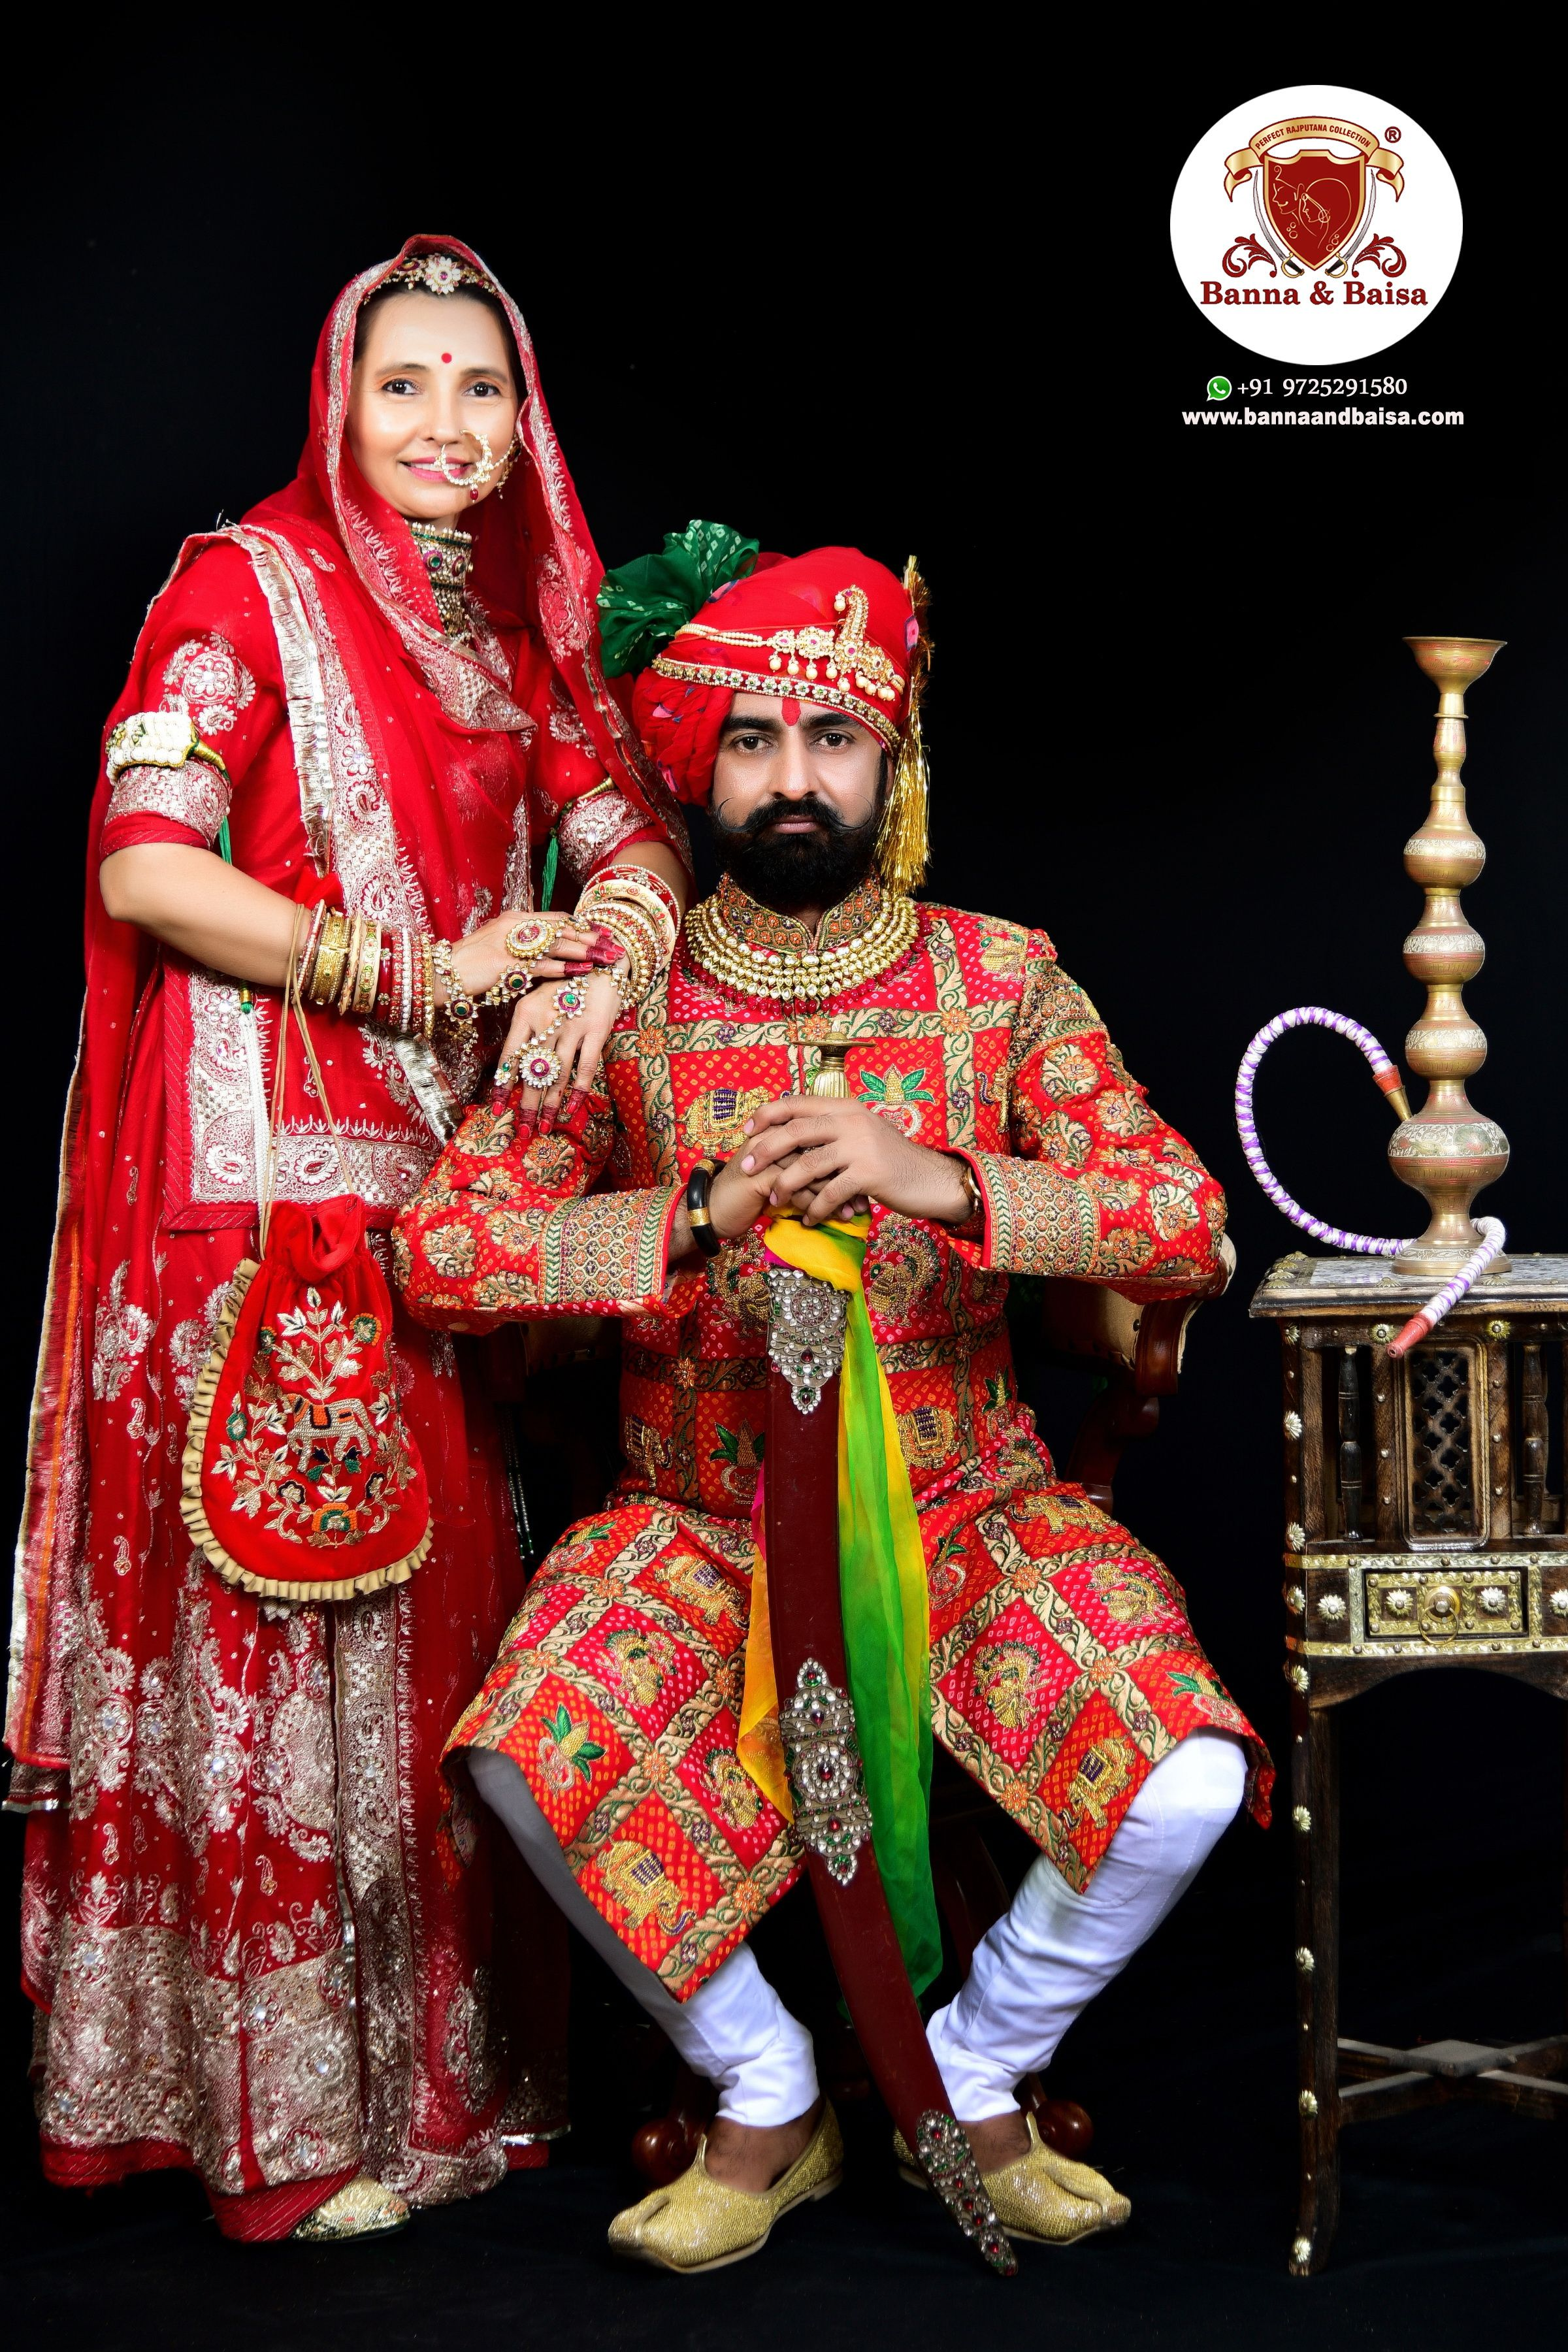 Pin By Ajay Vaghela On Ajay In 2020 Best Wedding Dress Designers Groom Wedding Dress Bridal Wedding Dresses